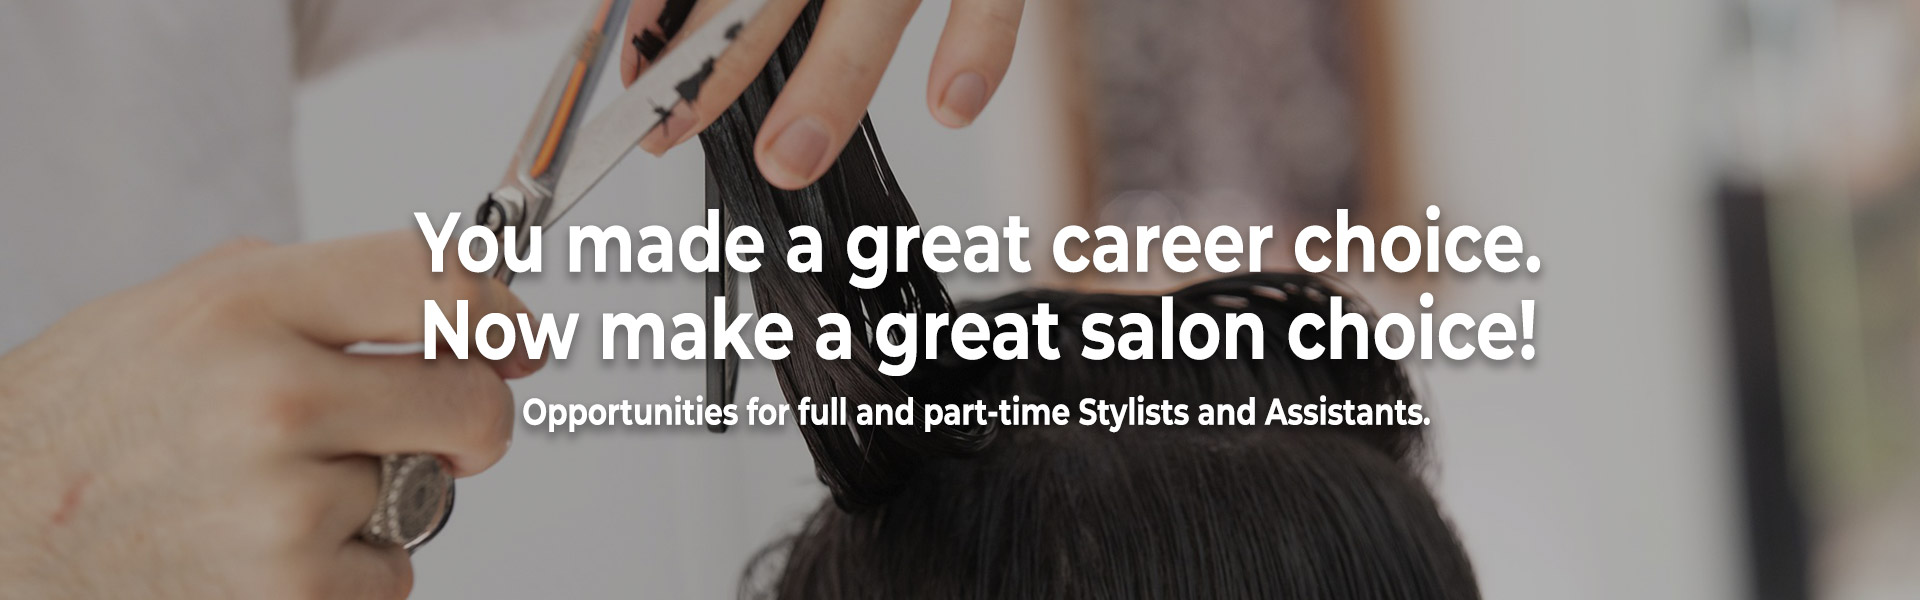 Element Hair salon is hiring